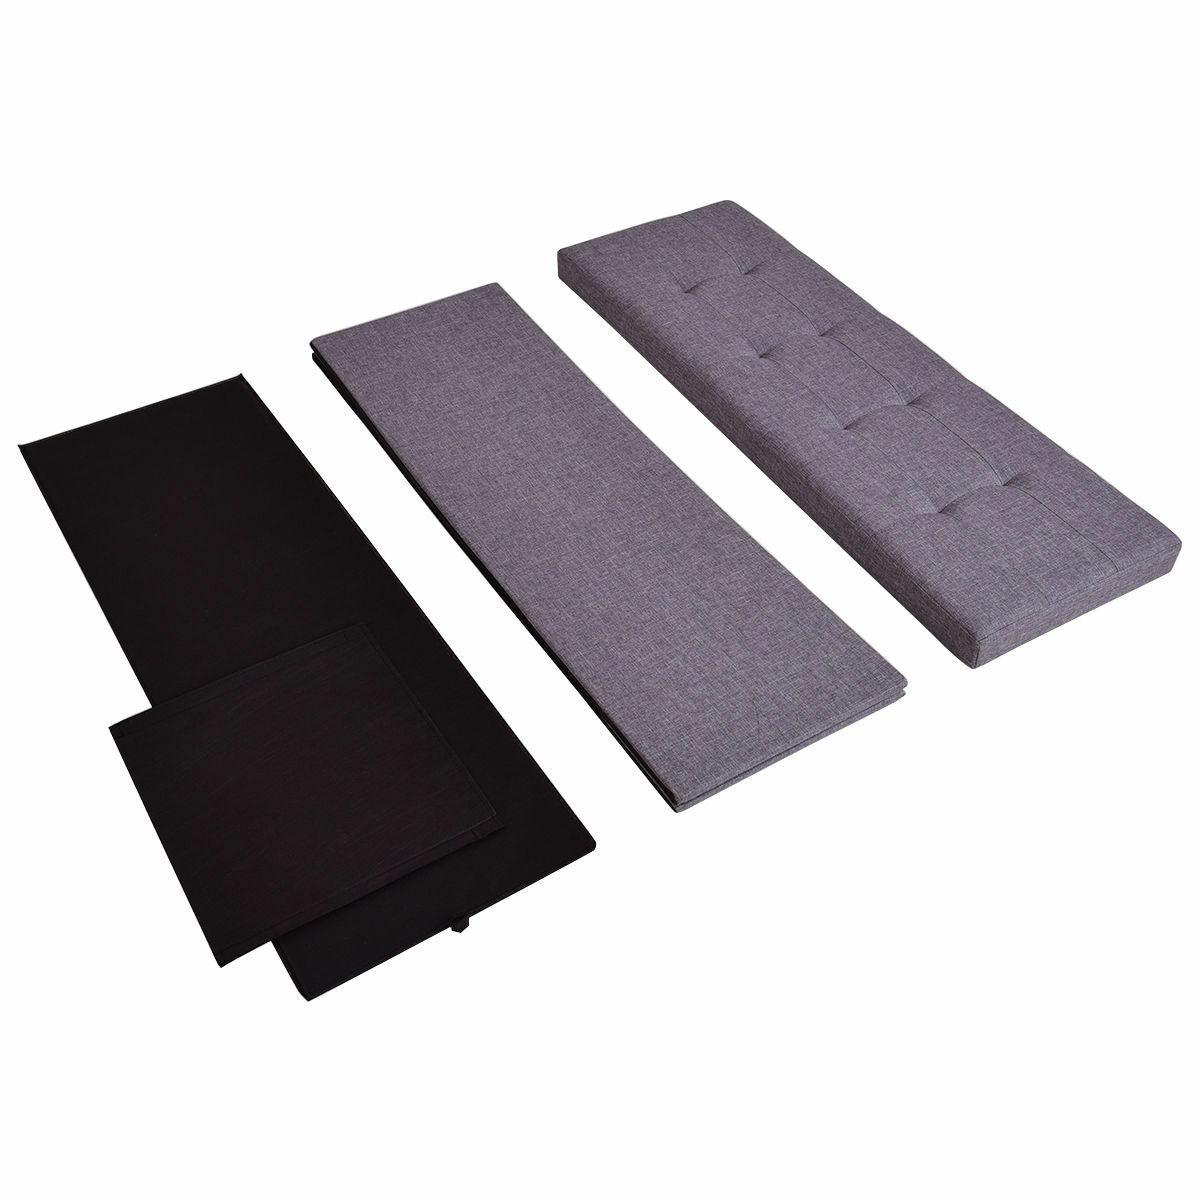 Gray Bench Storage Stool Footrest